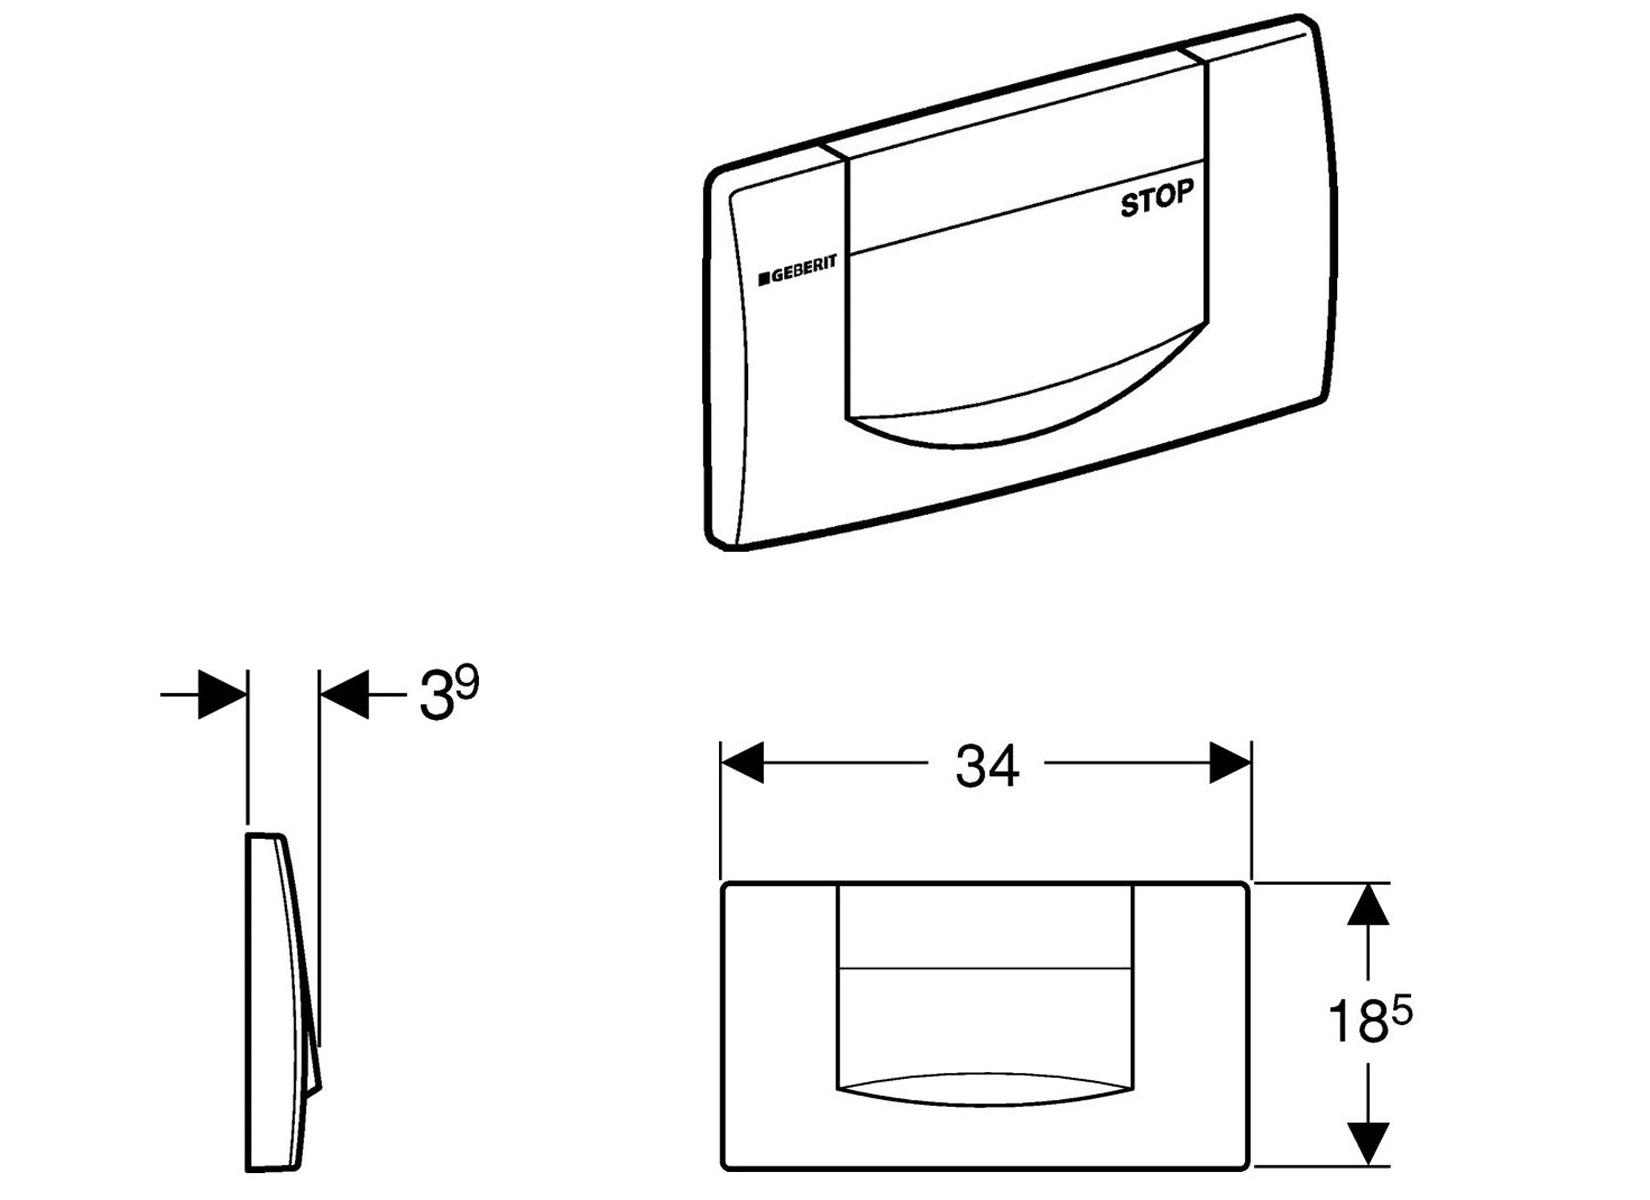 geberit dr ckerplatte 200f seidenglanz chrom. Black Bedroom Furniture Sets. Home Design Ideas